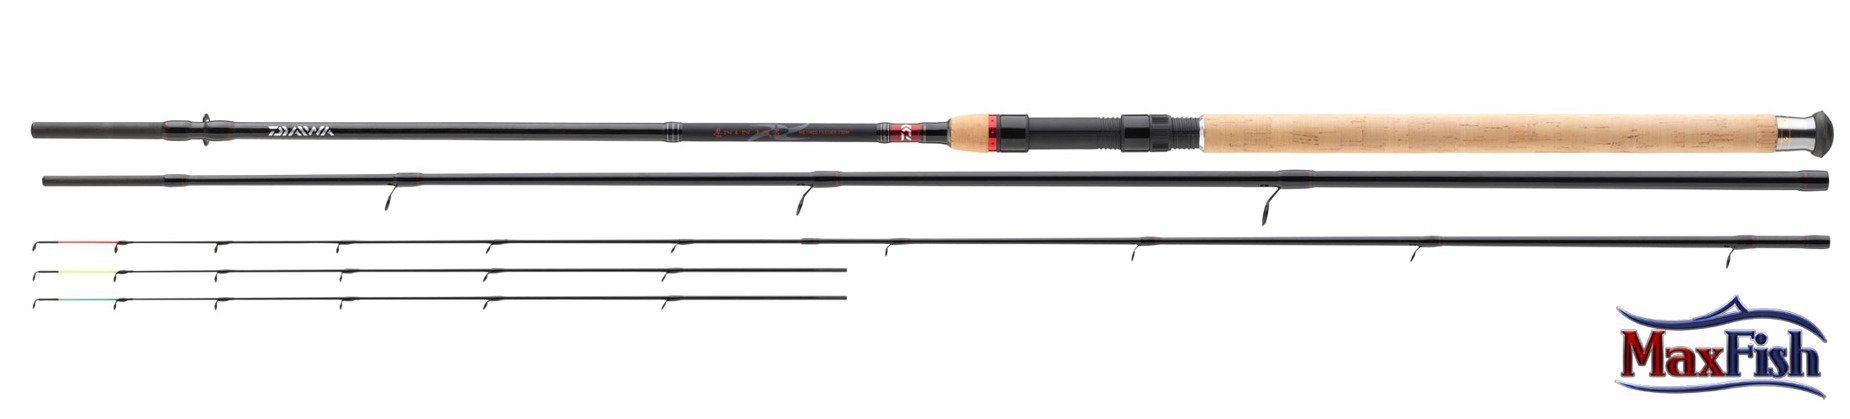 Daiwa Ninja X Method Feeder 330cm -80g